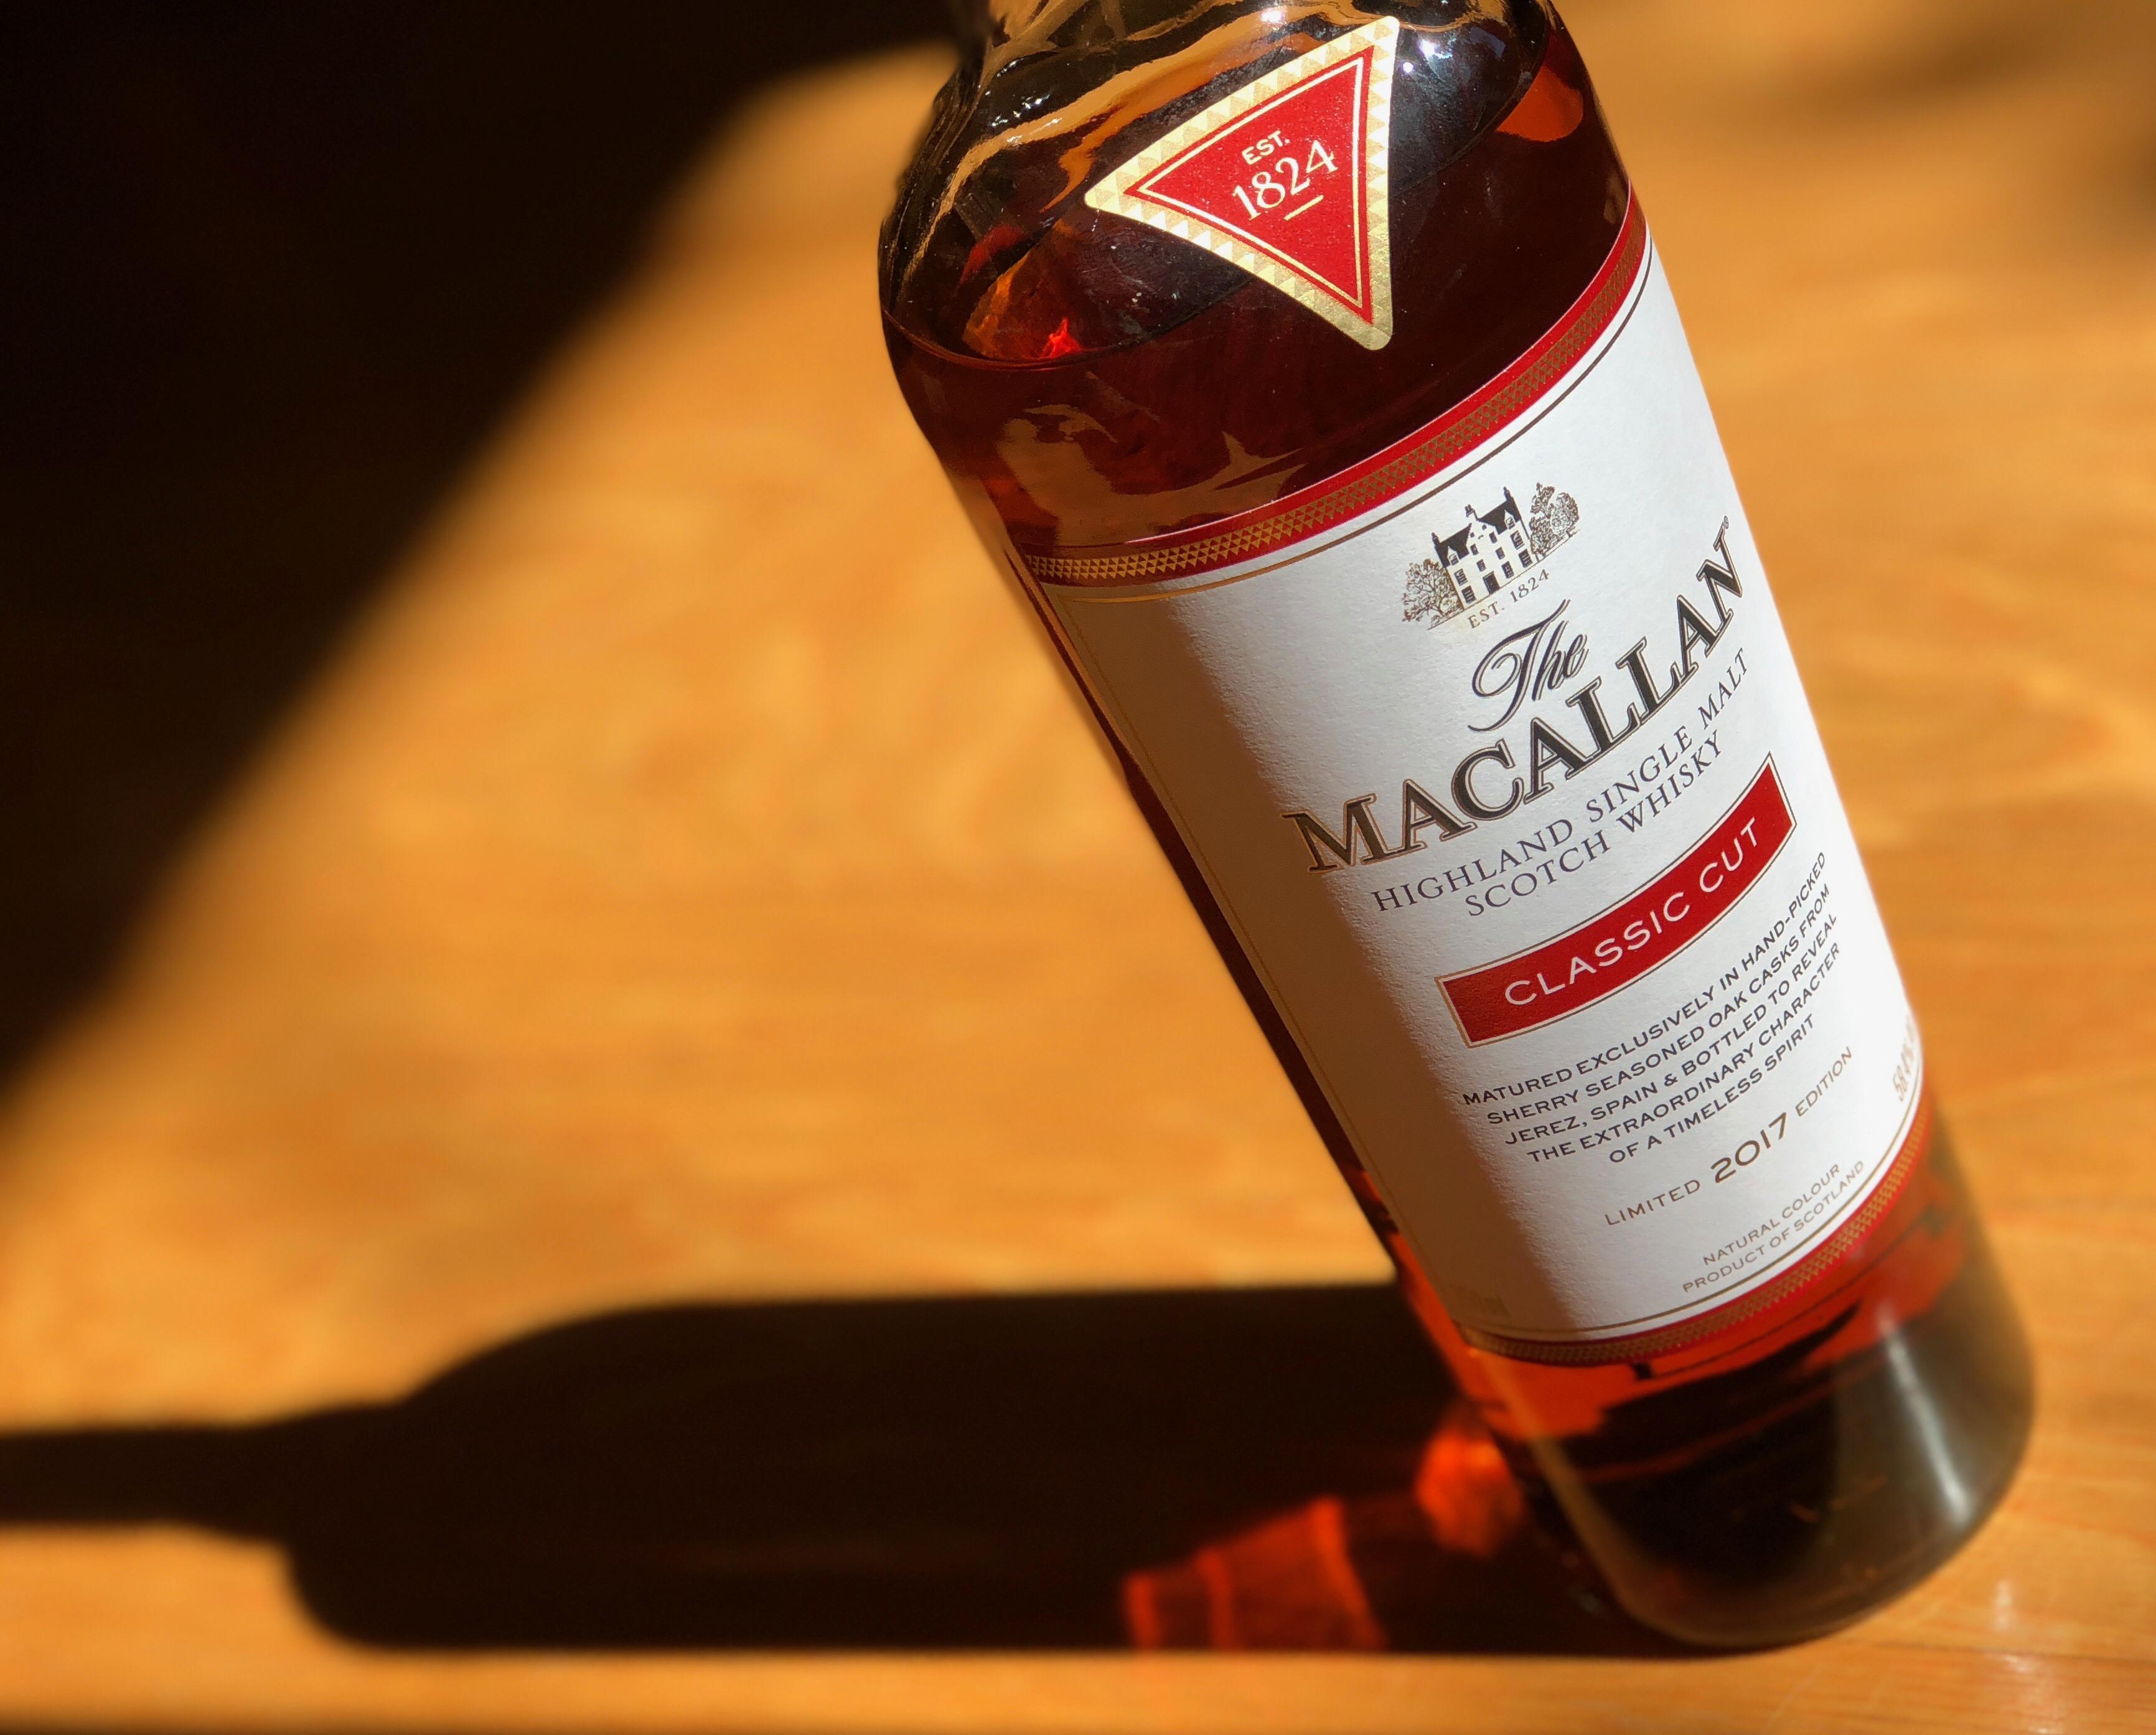 Macallan Classic Cut Cask Strength